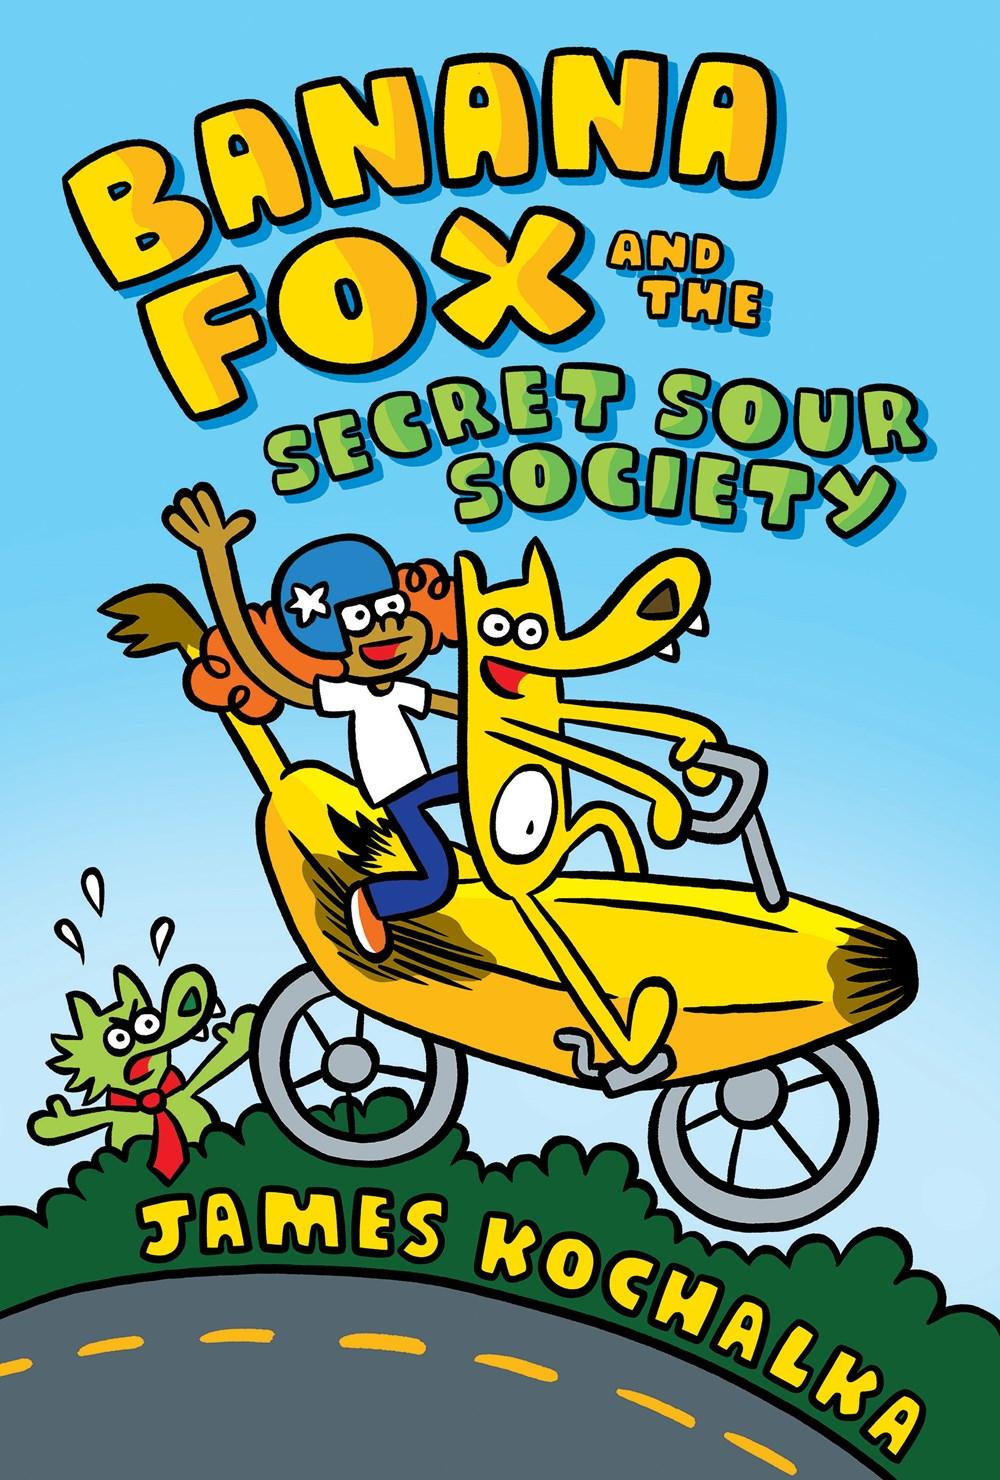 Banana Fox and the Secret Sour Society by James Kochalka